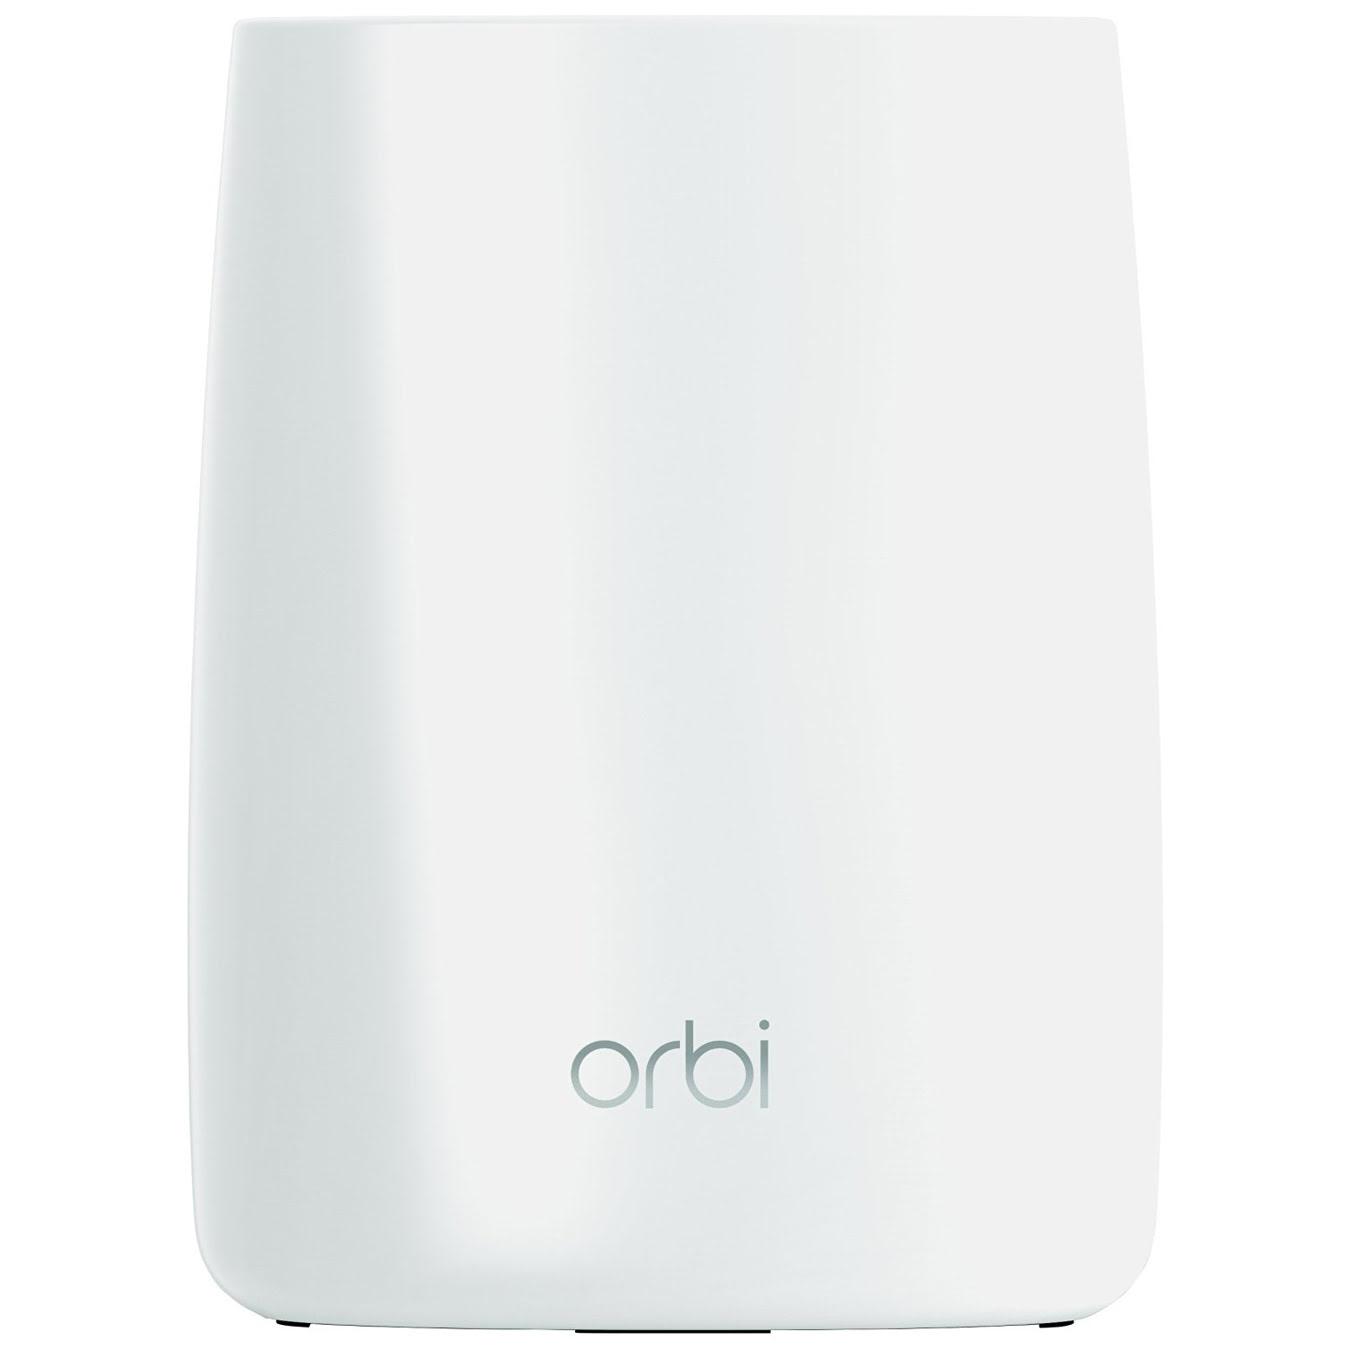 Orbi Système Wifi RBK50-100PES - AC3000 - Cybertek.fr - 3